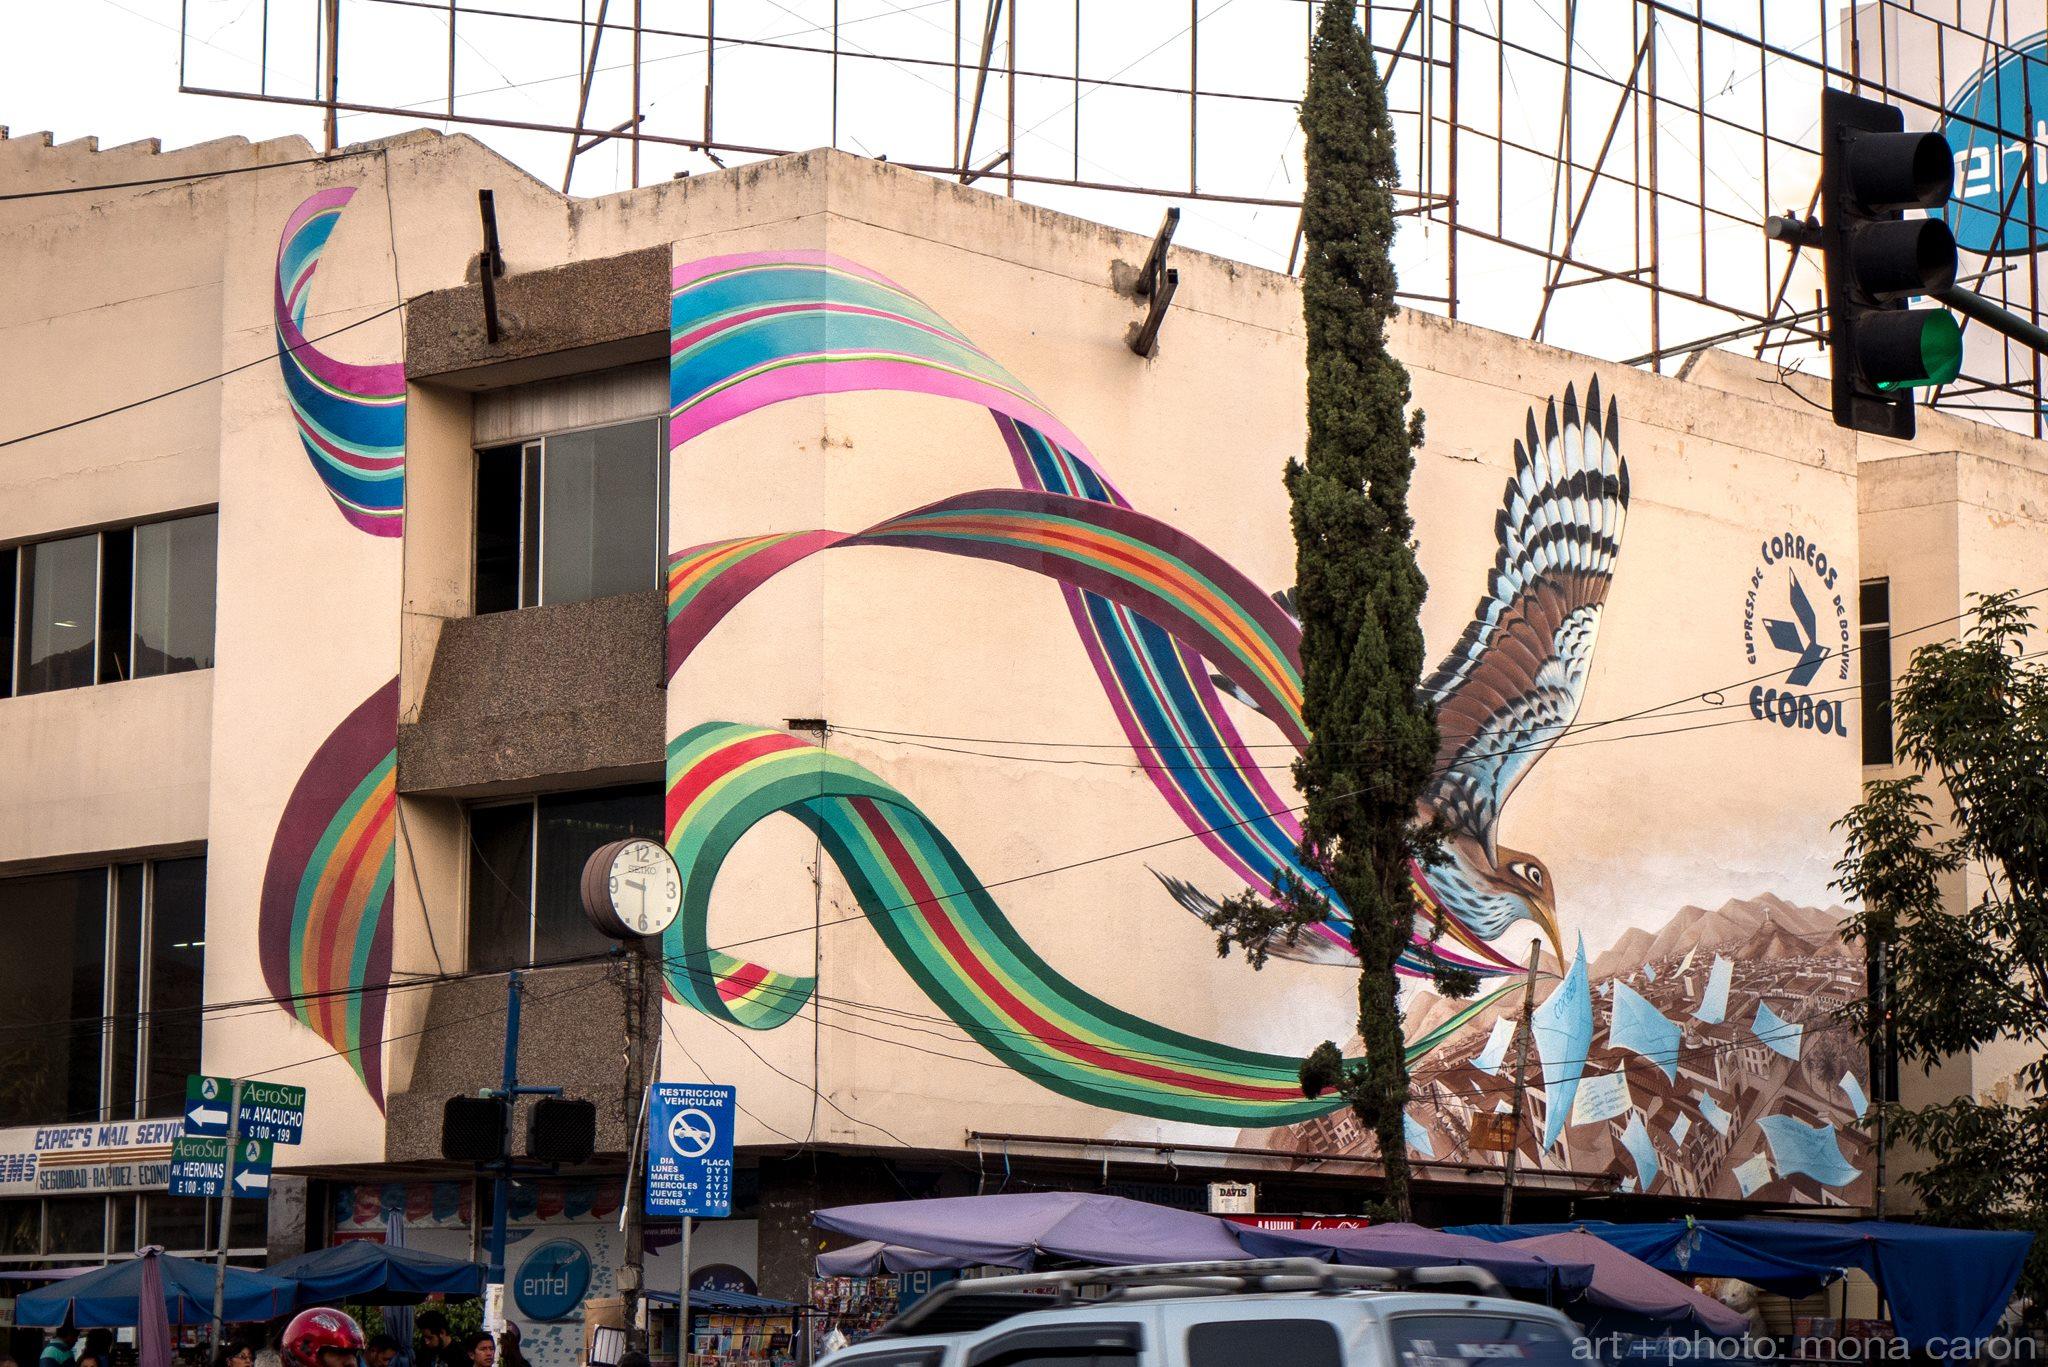 mona caron graffiti mural weeds (22)